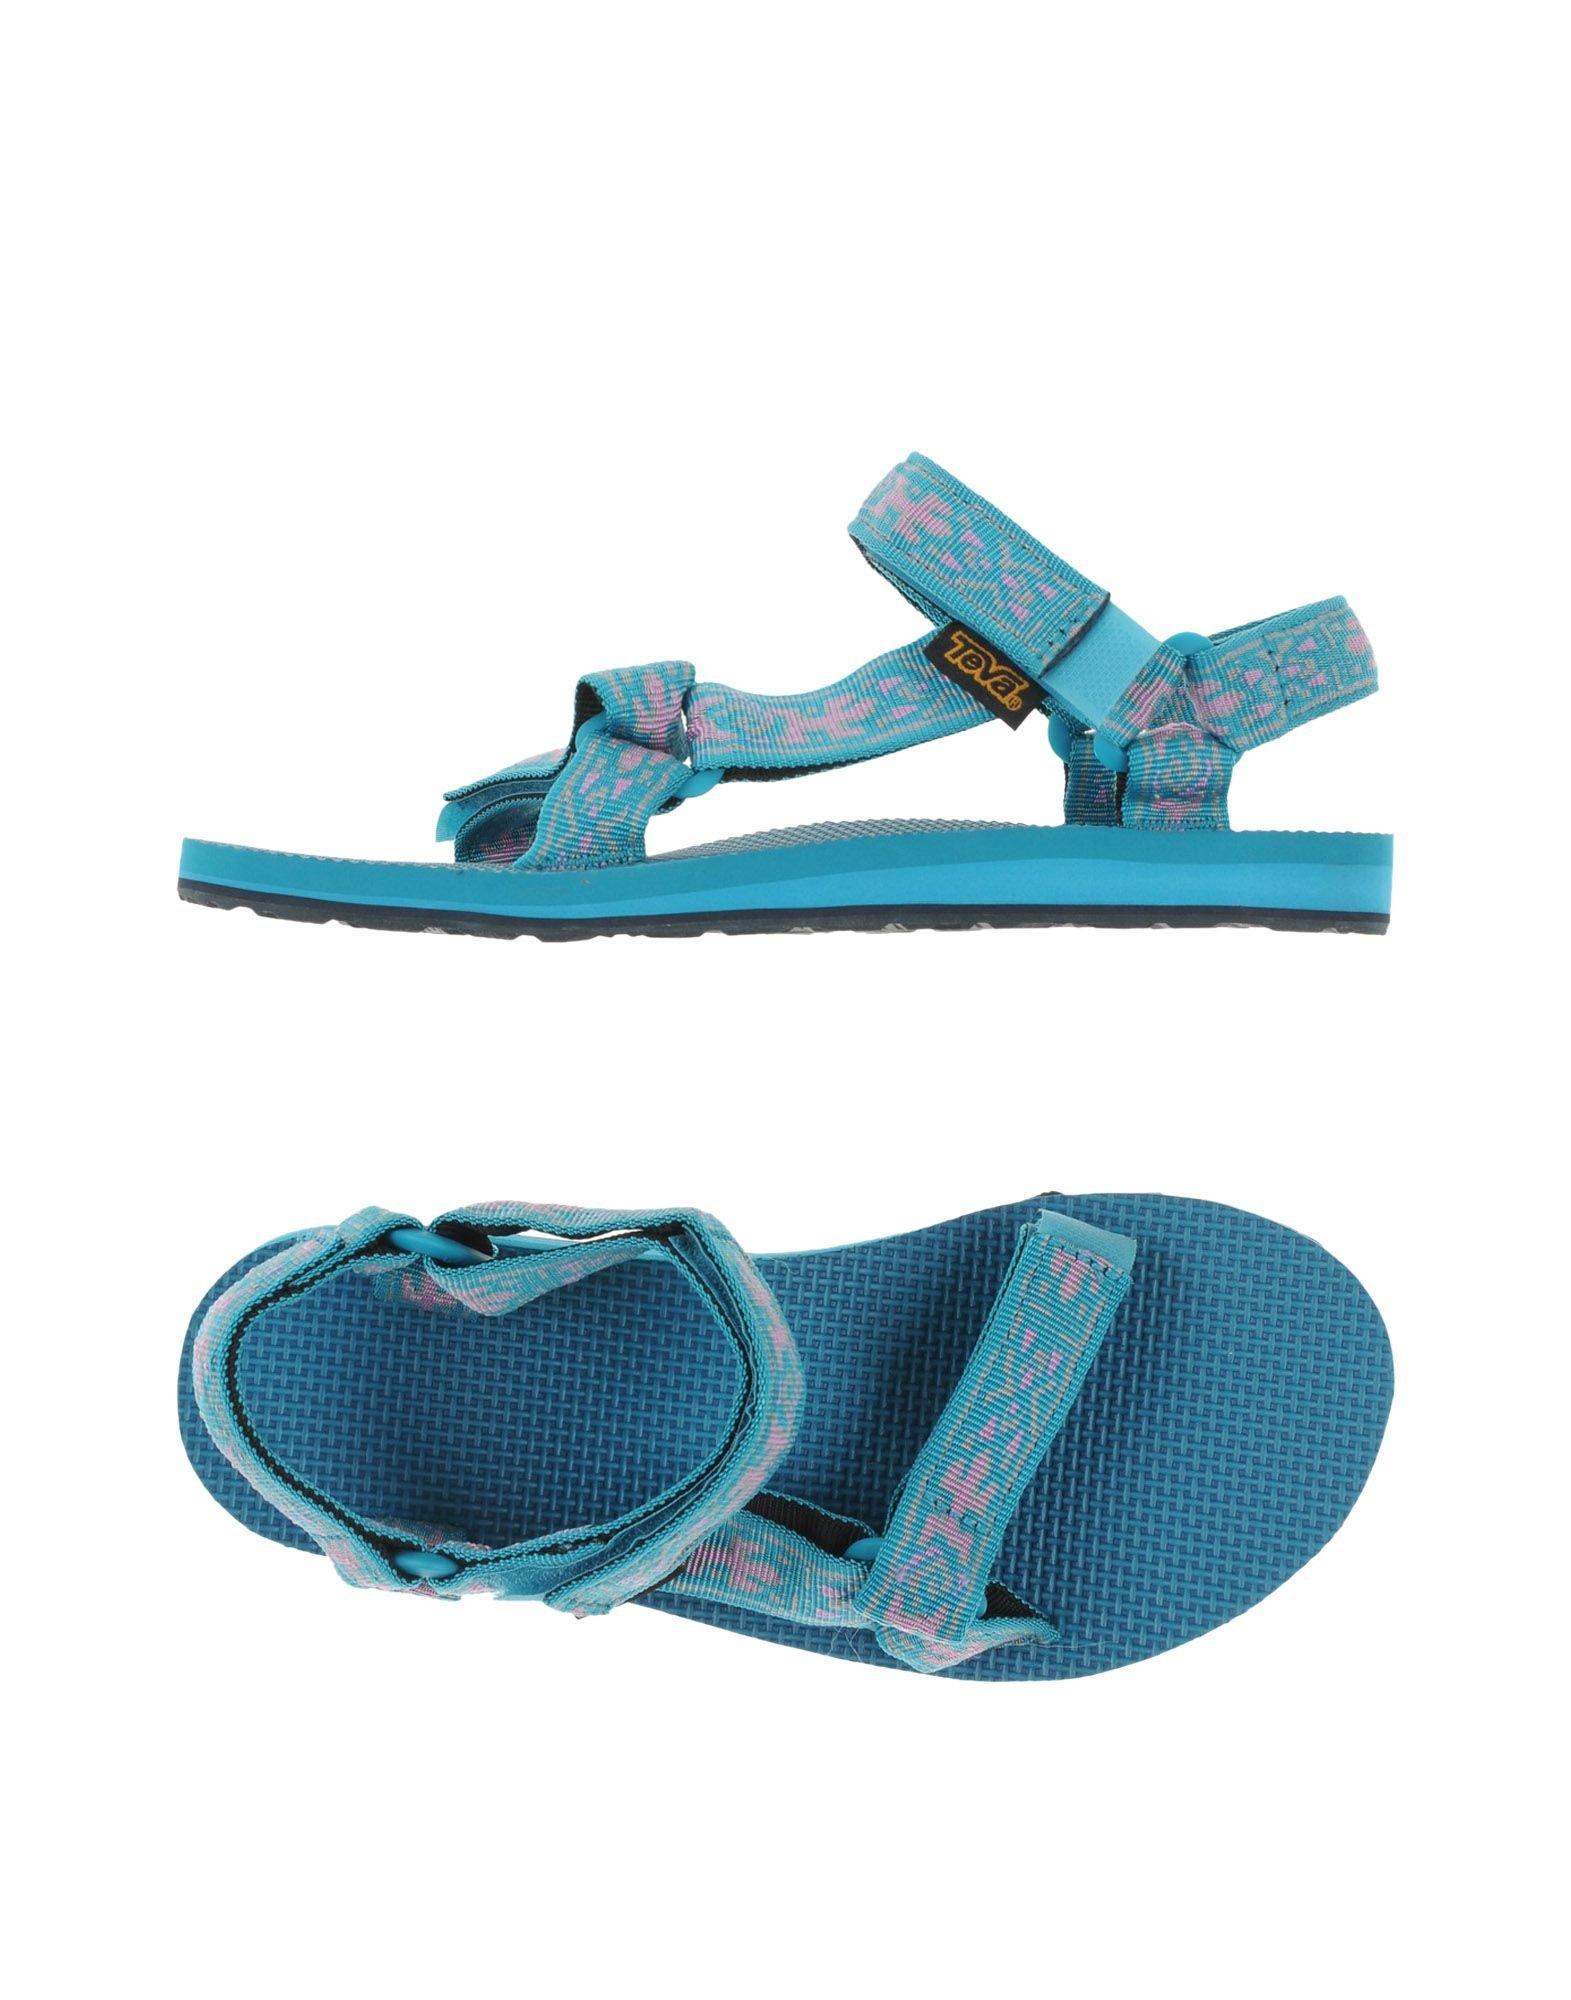 f99214c0ba2c34 Lyst - Teva Sandals in Blue